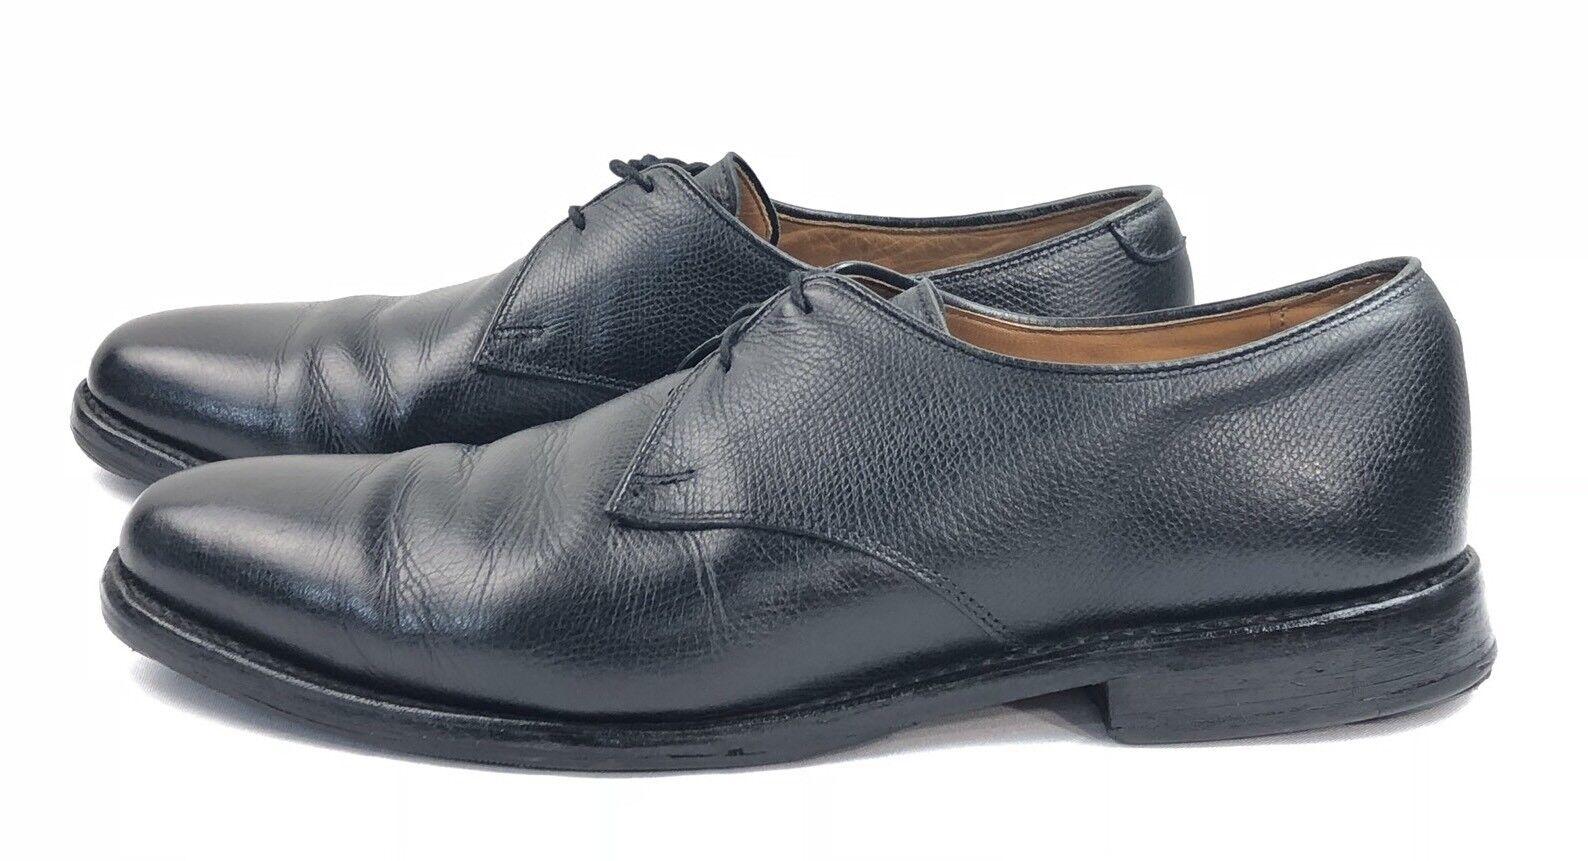 Allen Edmonds Lambert Negro Cuero Grano Oxford de vestir Zapatos Hombre US 9.5 B